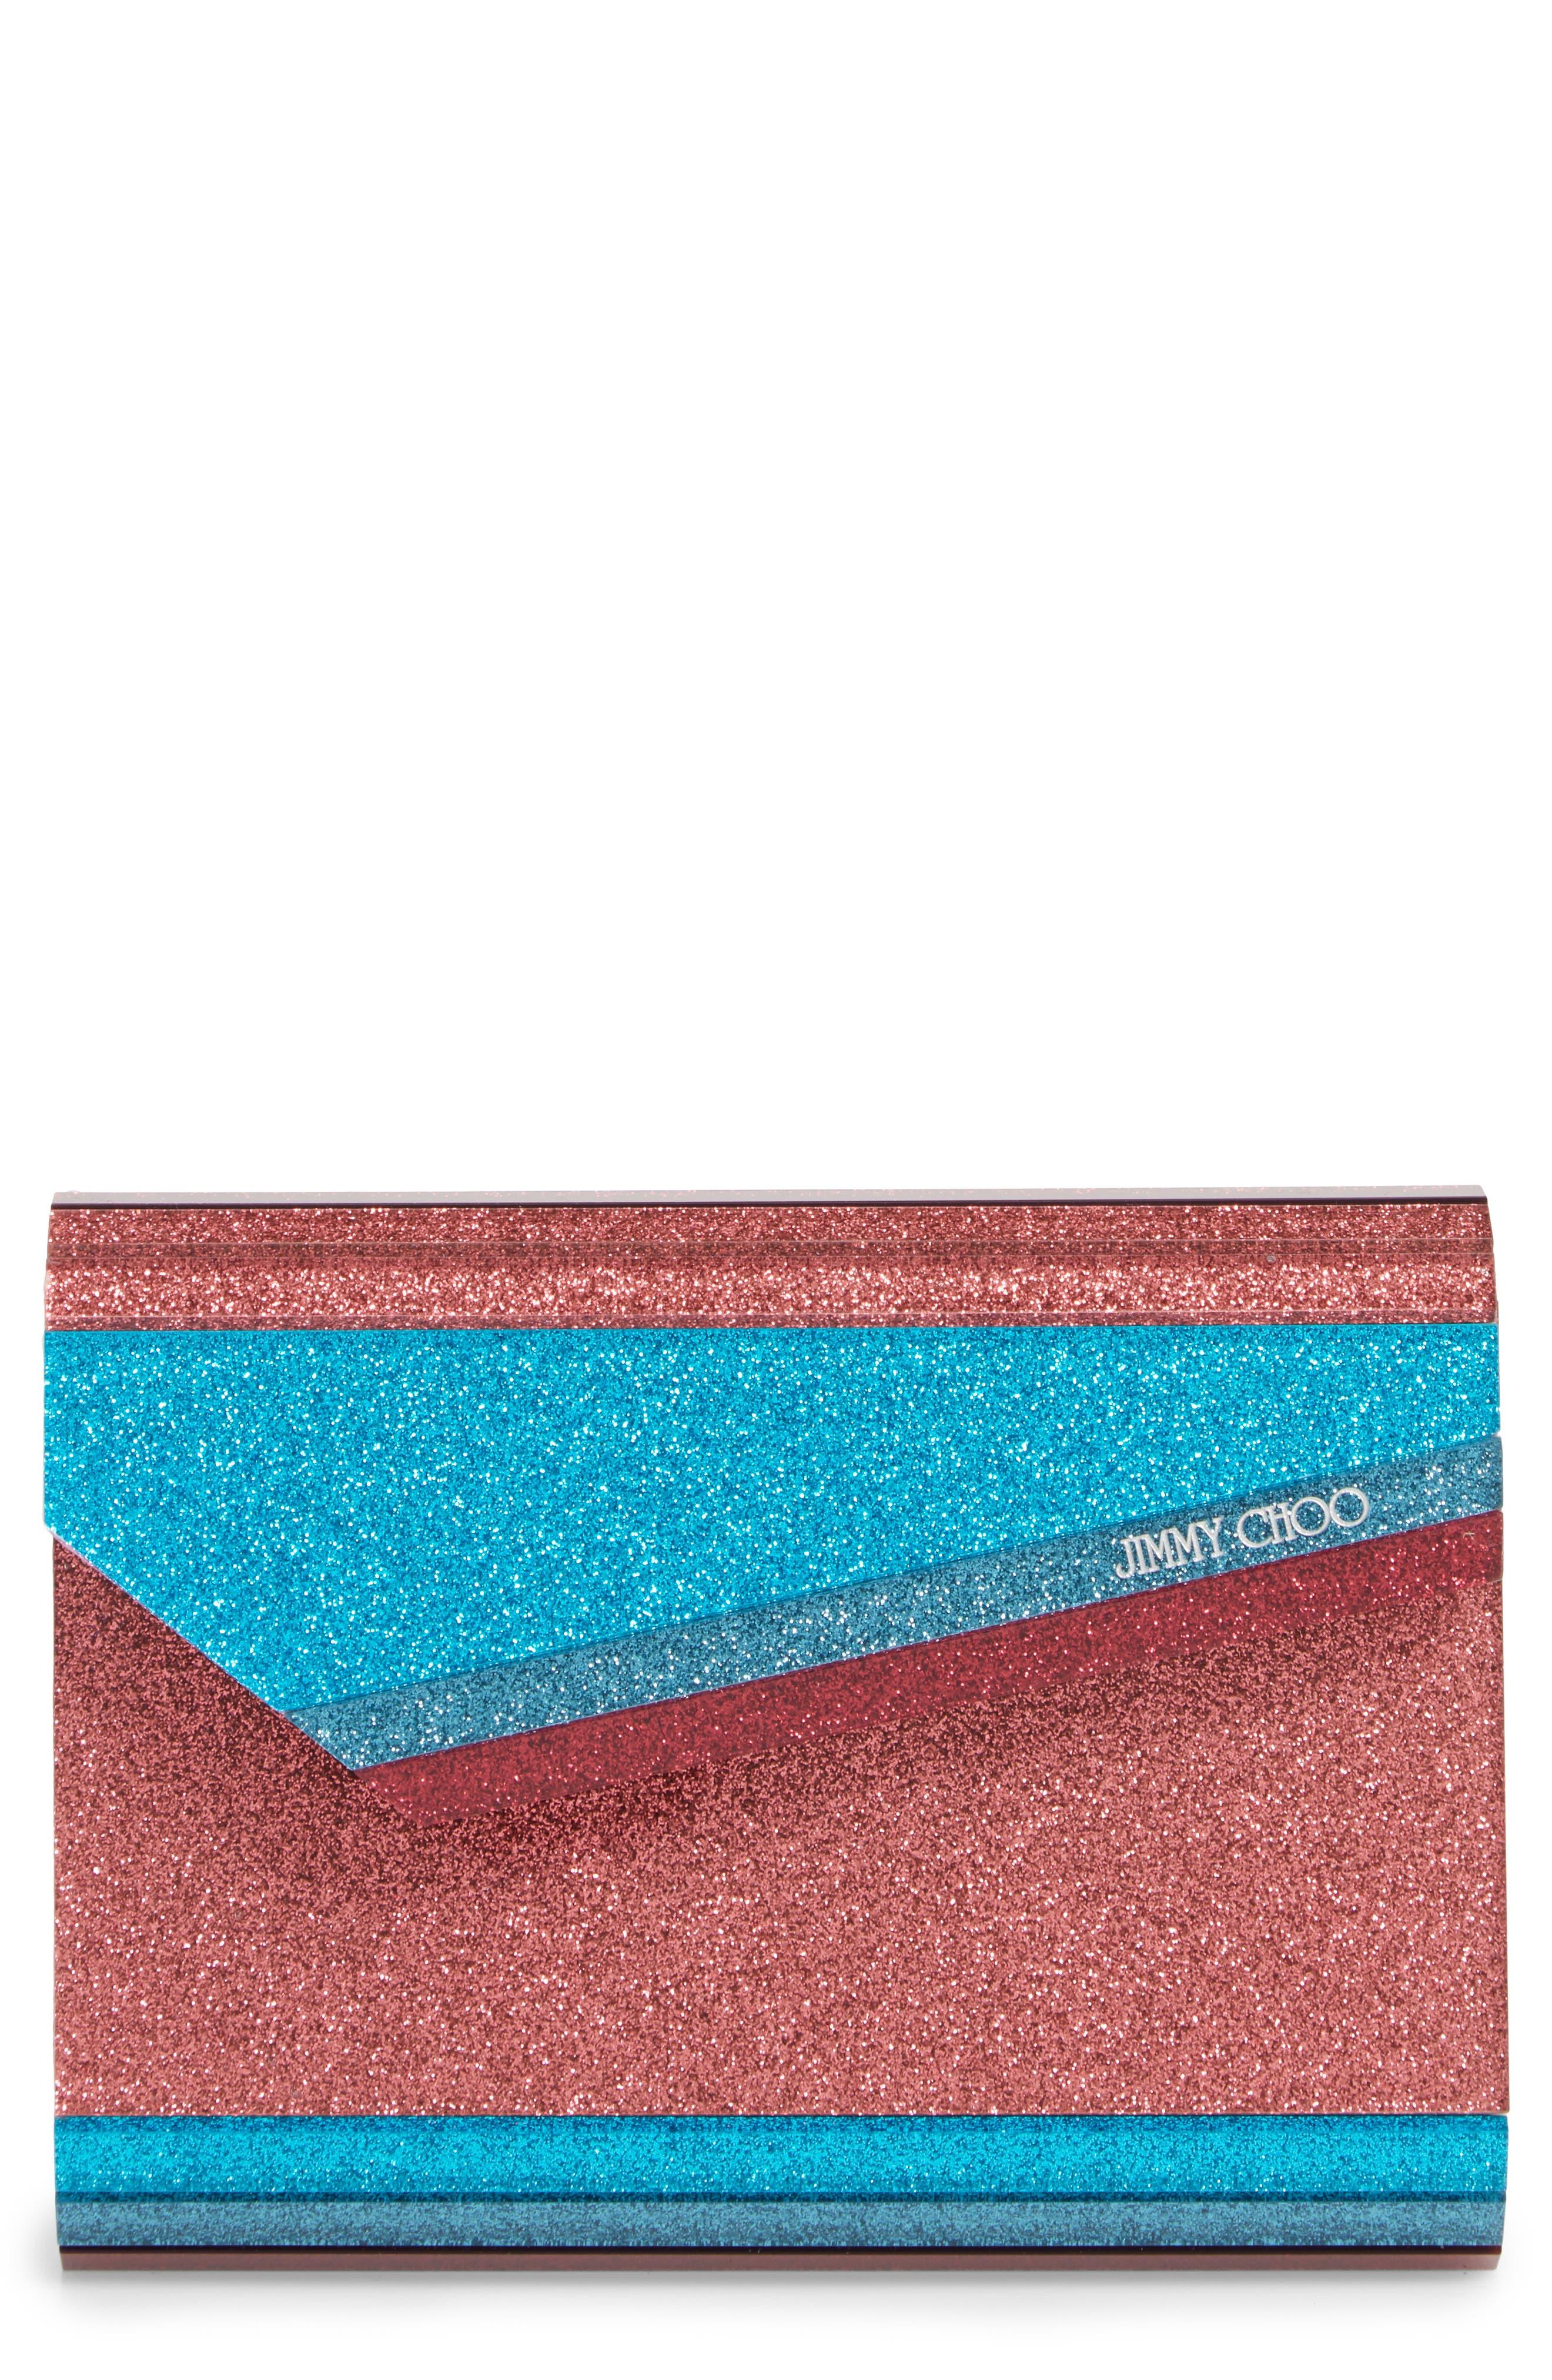 JIMMY CHOO Candy Colorblock Glitter Clutch, Main, color, RASPBERRY MIX